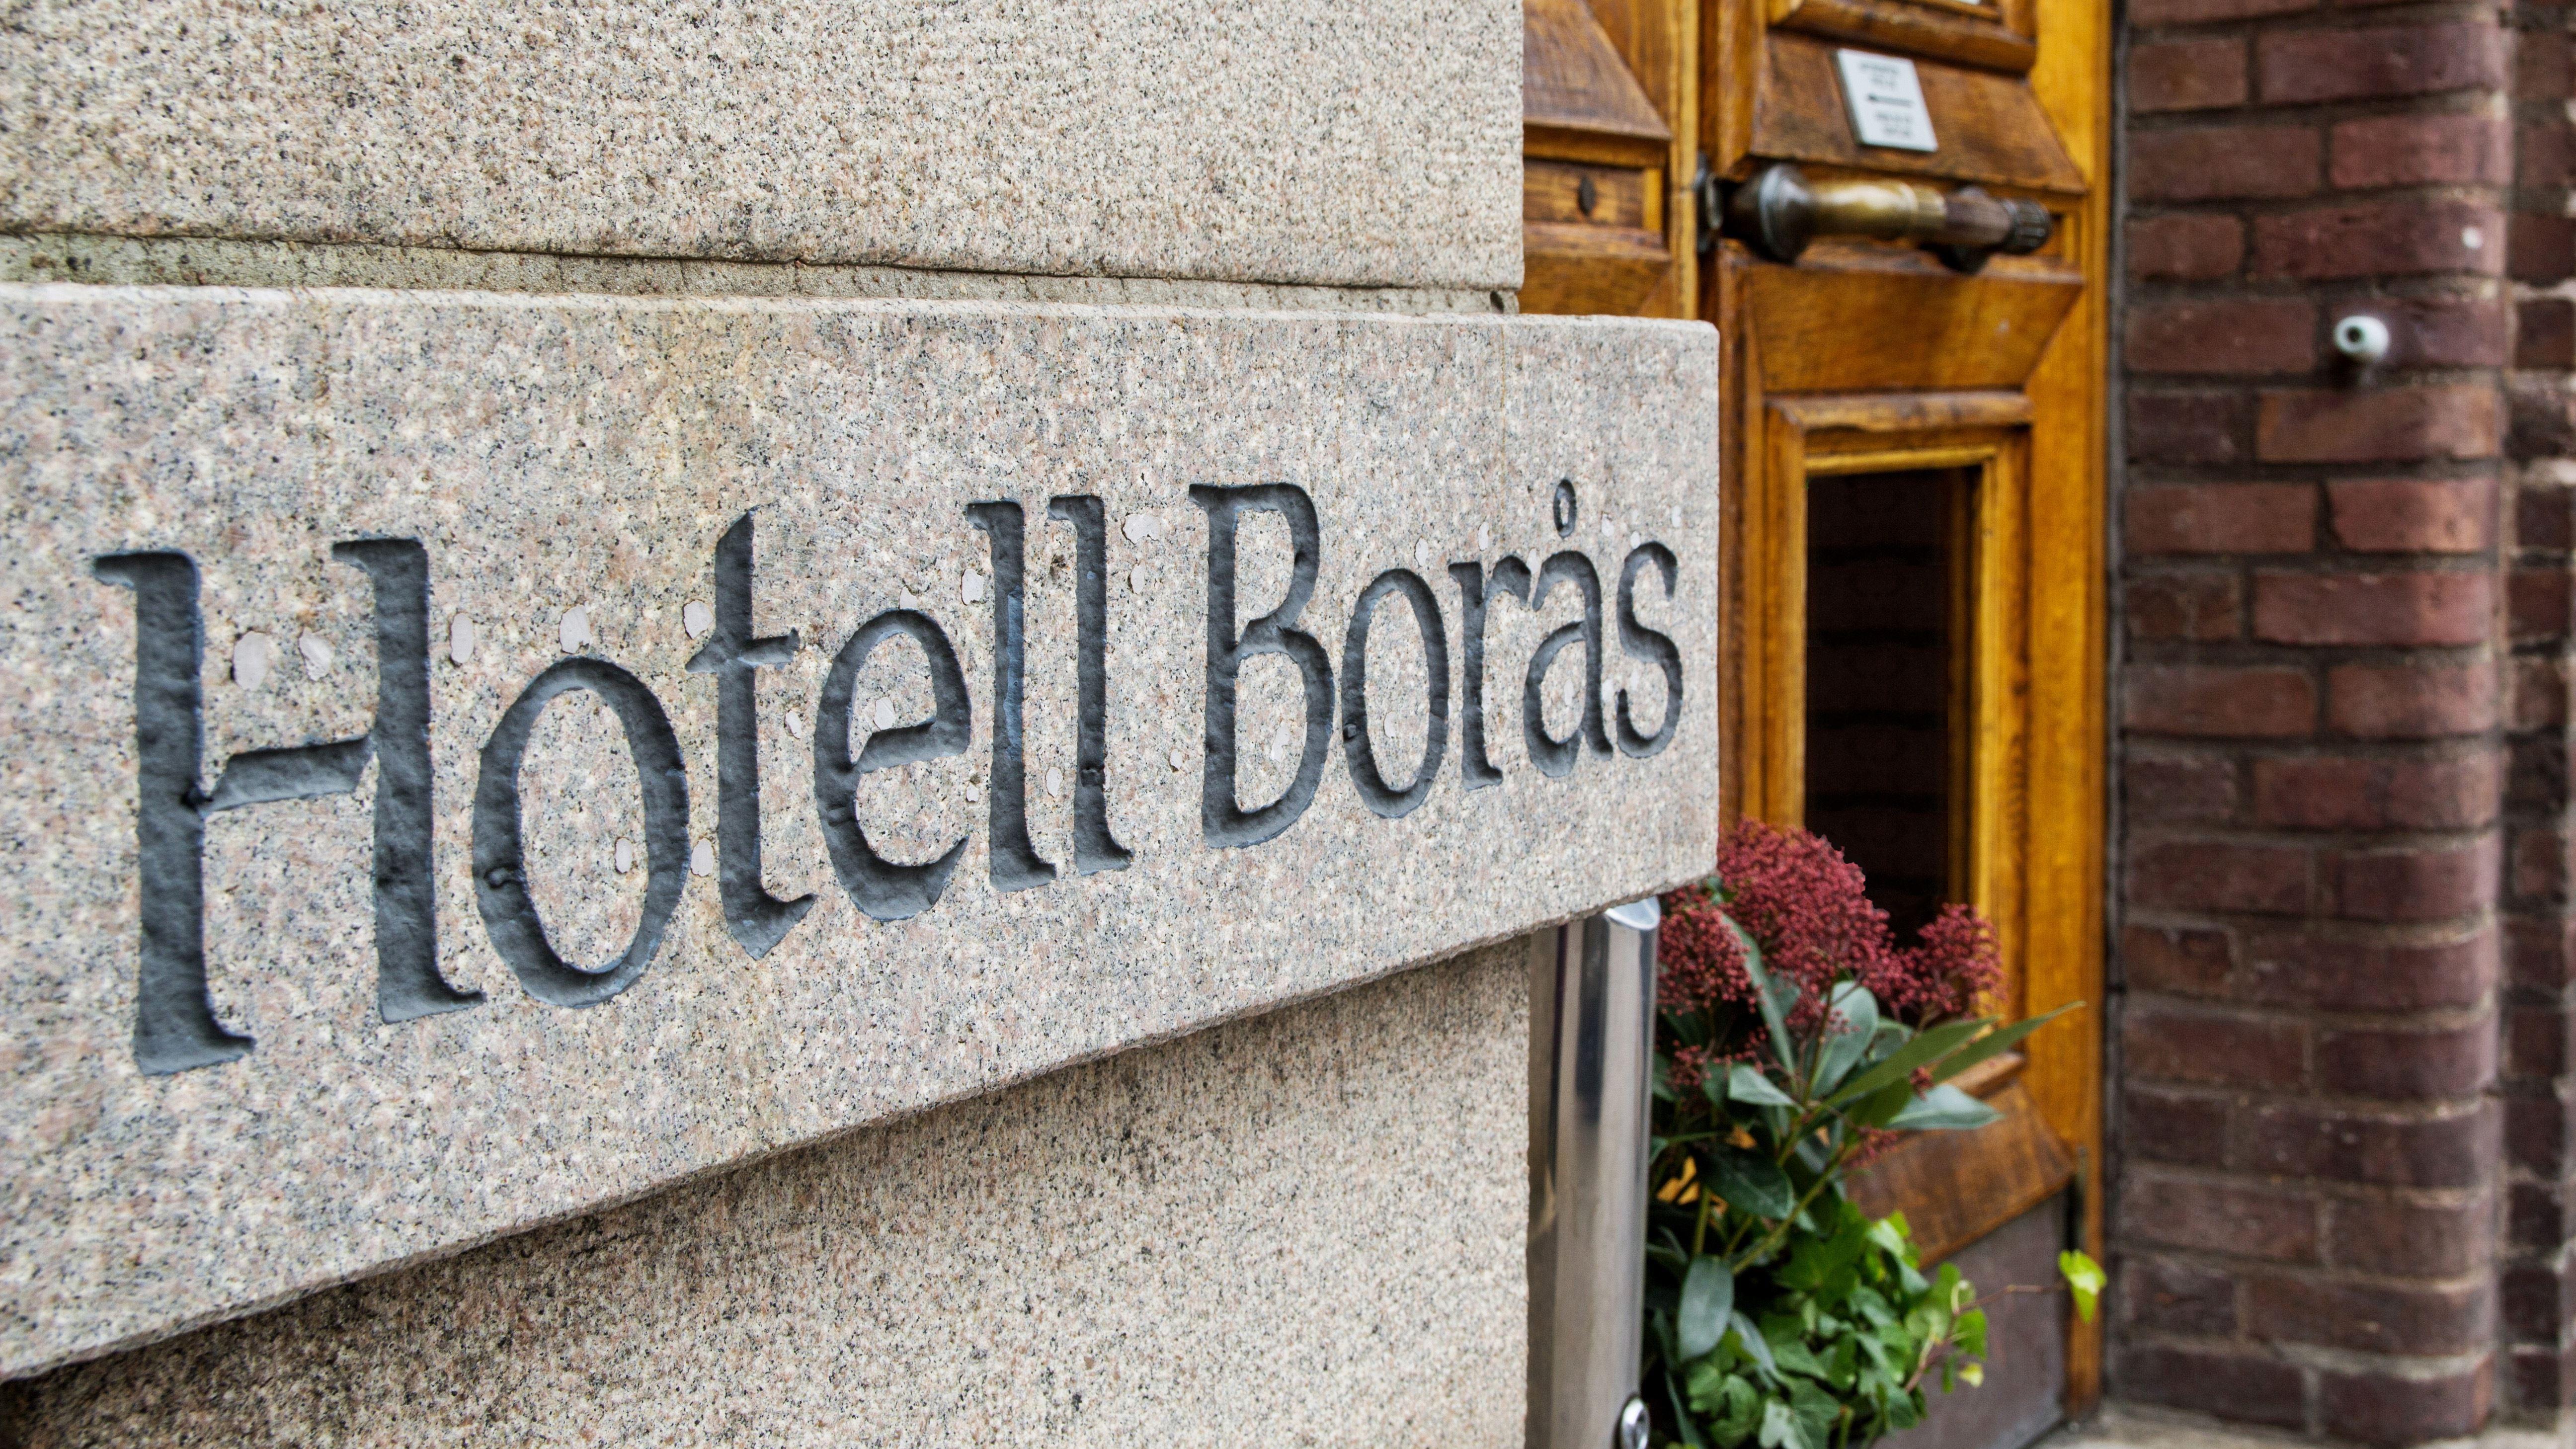 Best Western Hotell Borås